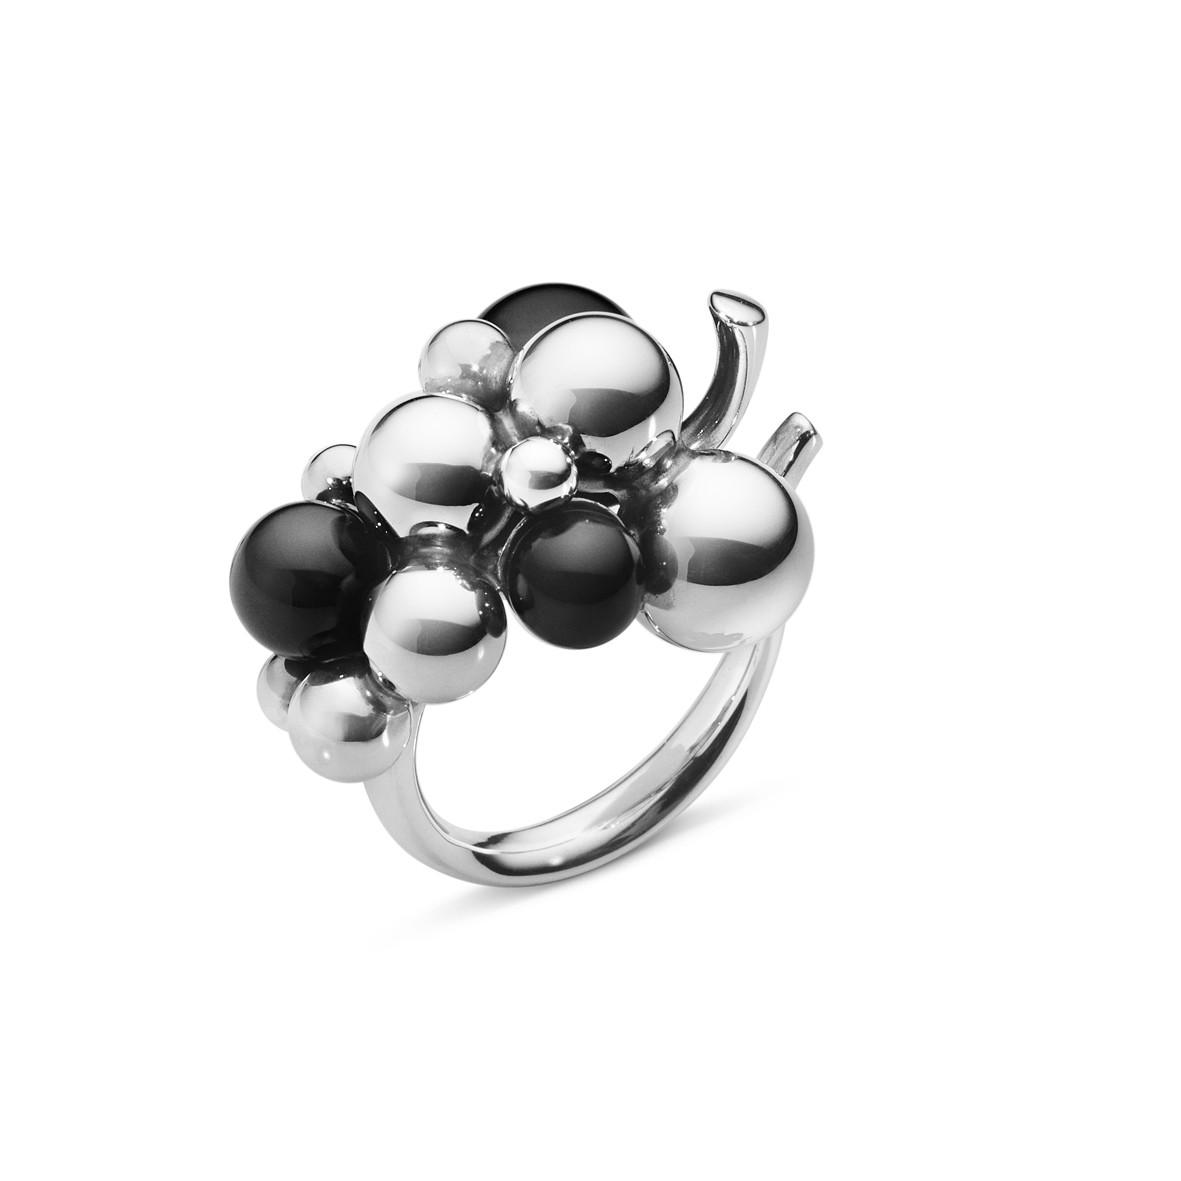 Georg Jensen Grape ring 551H sort onyx - 10014391 Sort onyx / M 53